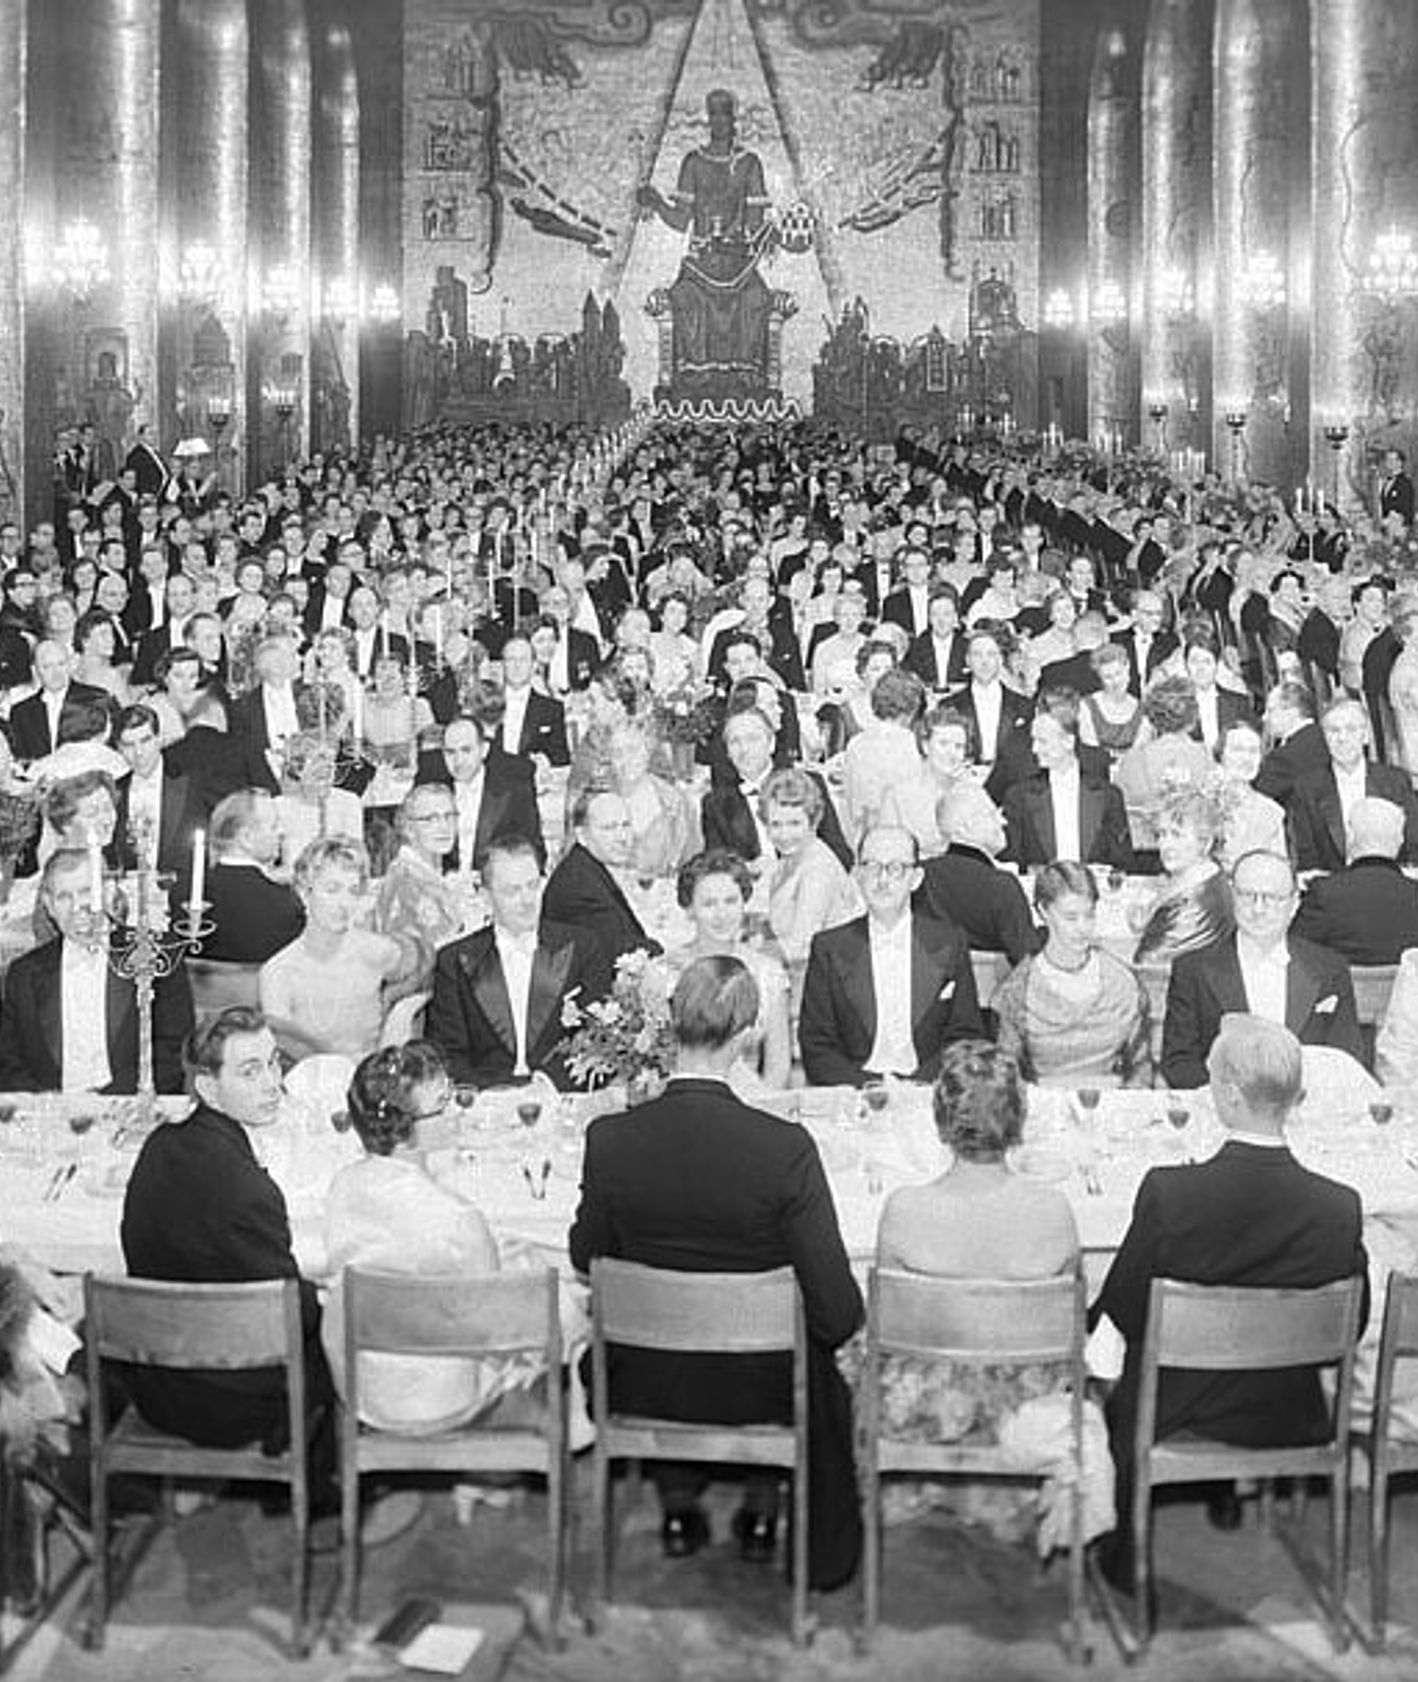 Bankiet noblowski w 1958 roku (fot. Brendler Åkerberg)